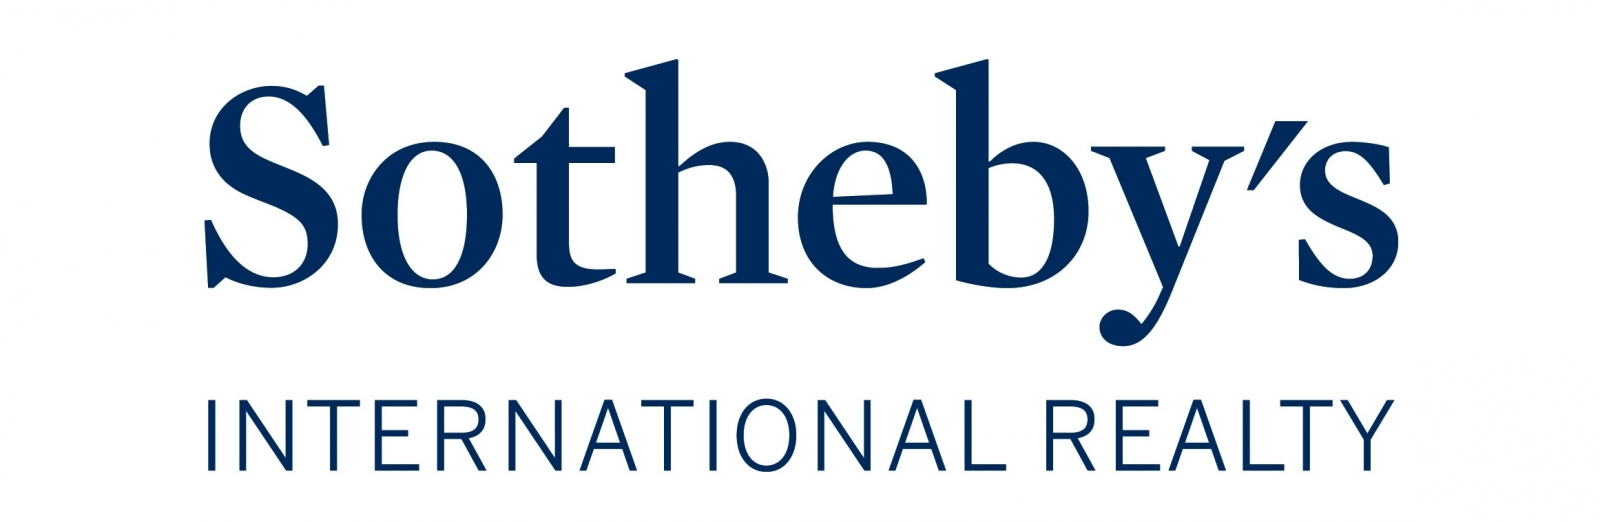 Ashton Coleman, P.A. Sotheby's International Realty